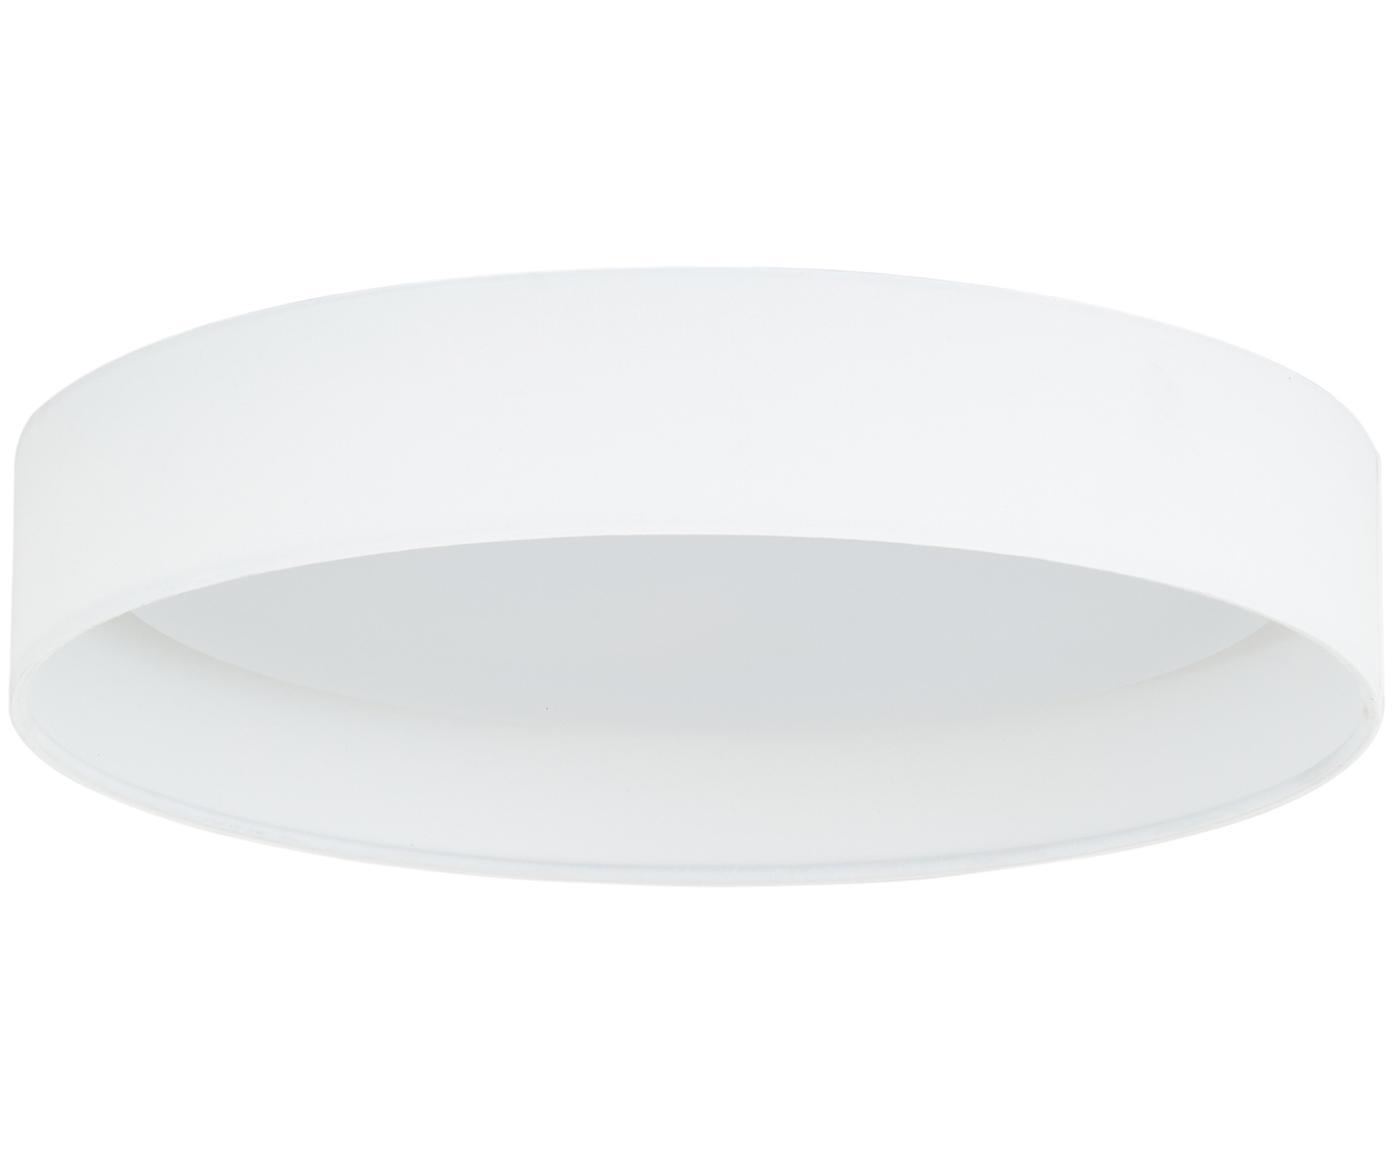 Plafoniera a LED Helen, Struttura: metallo, Bianco, Ø 35 x Alt. 7 cm